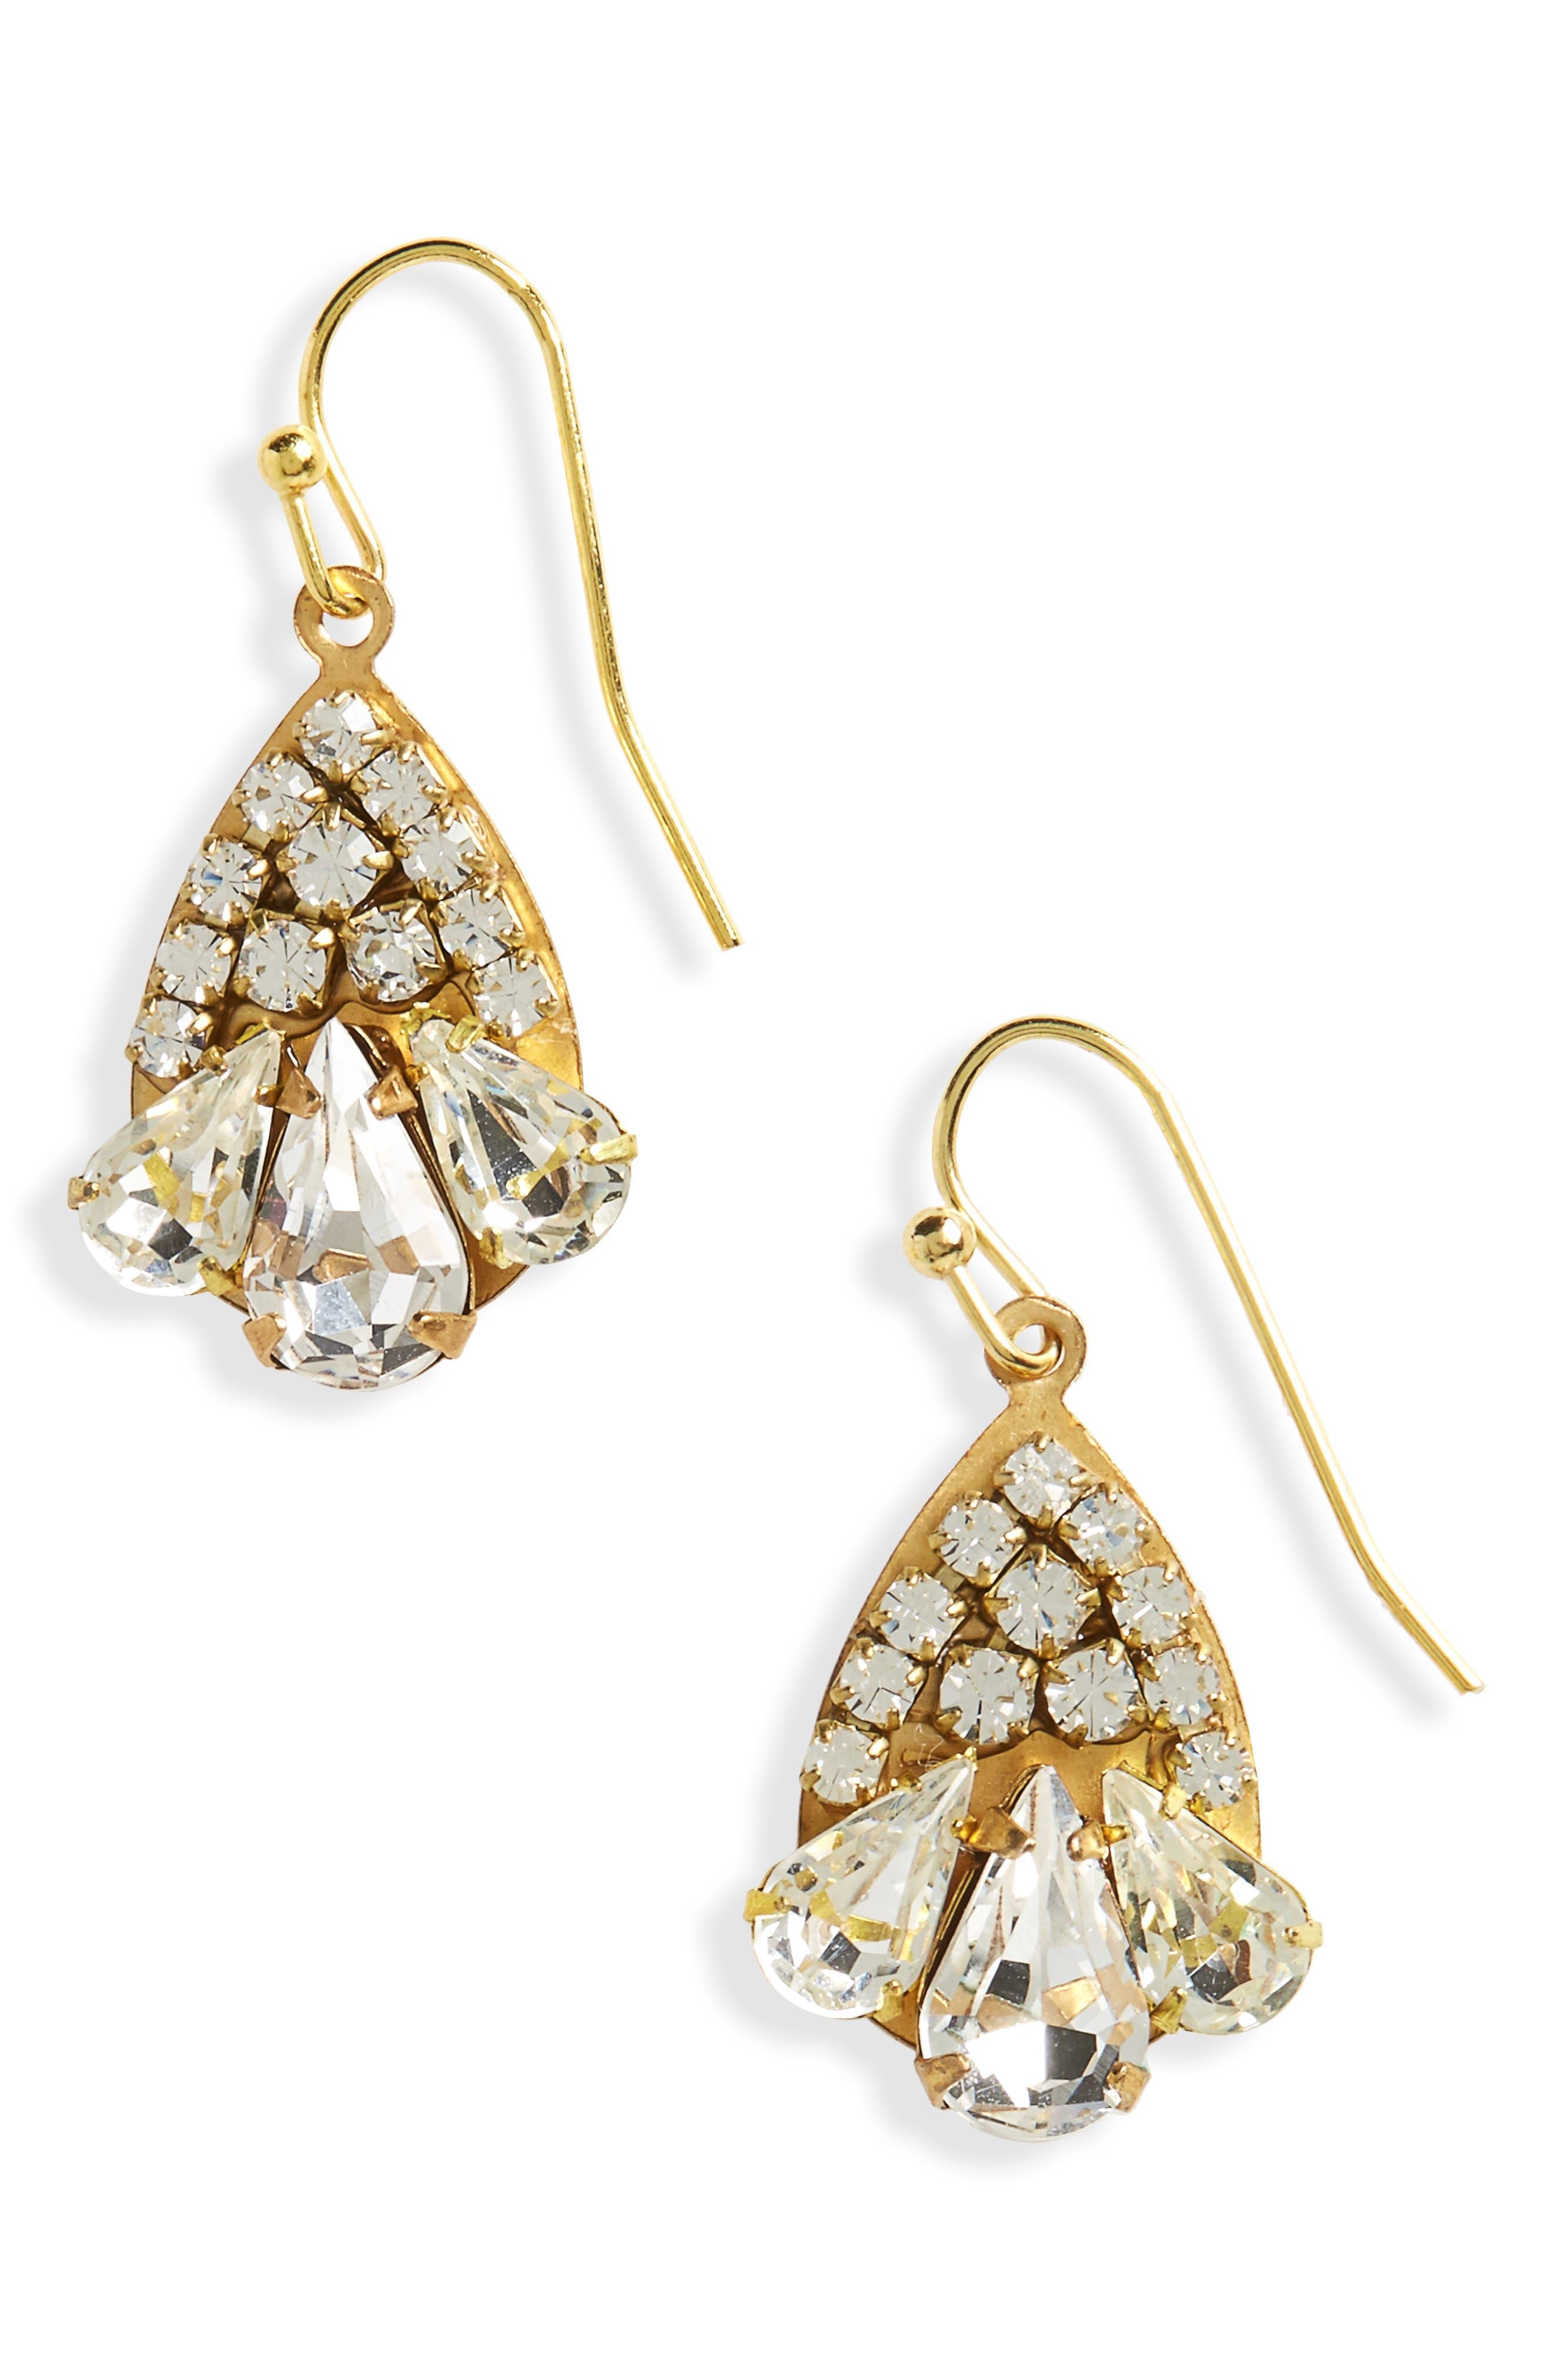 Scalloped Crystal Earrings,                             Main thumbnail 1, color,                             Crystal/ Gold